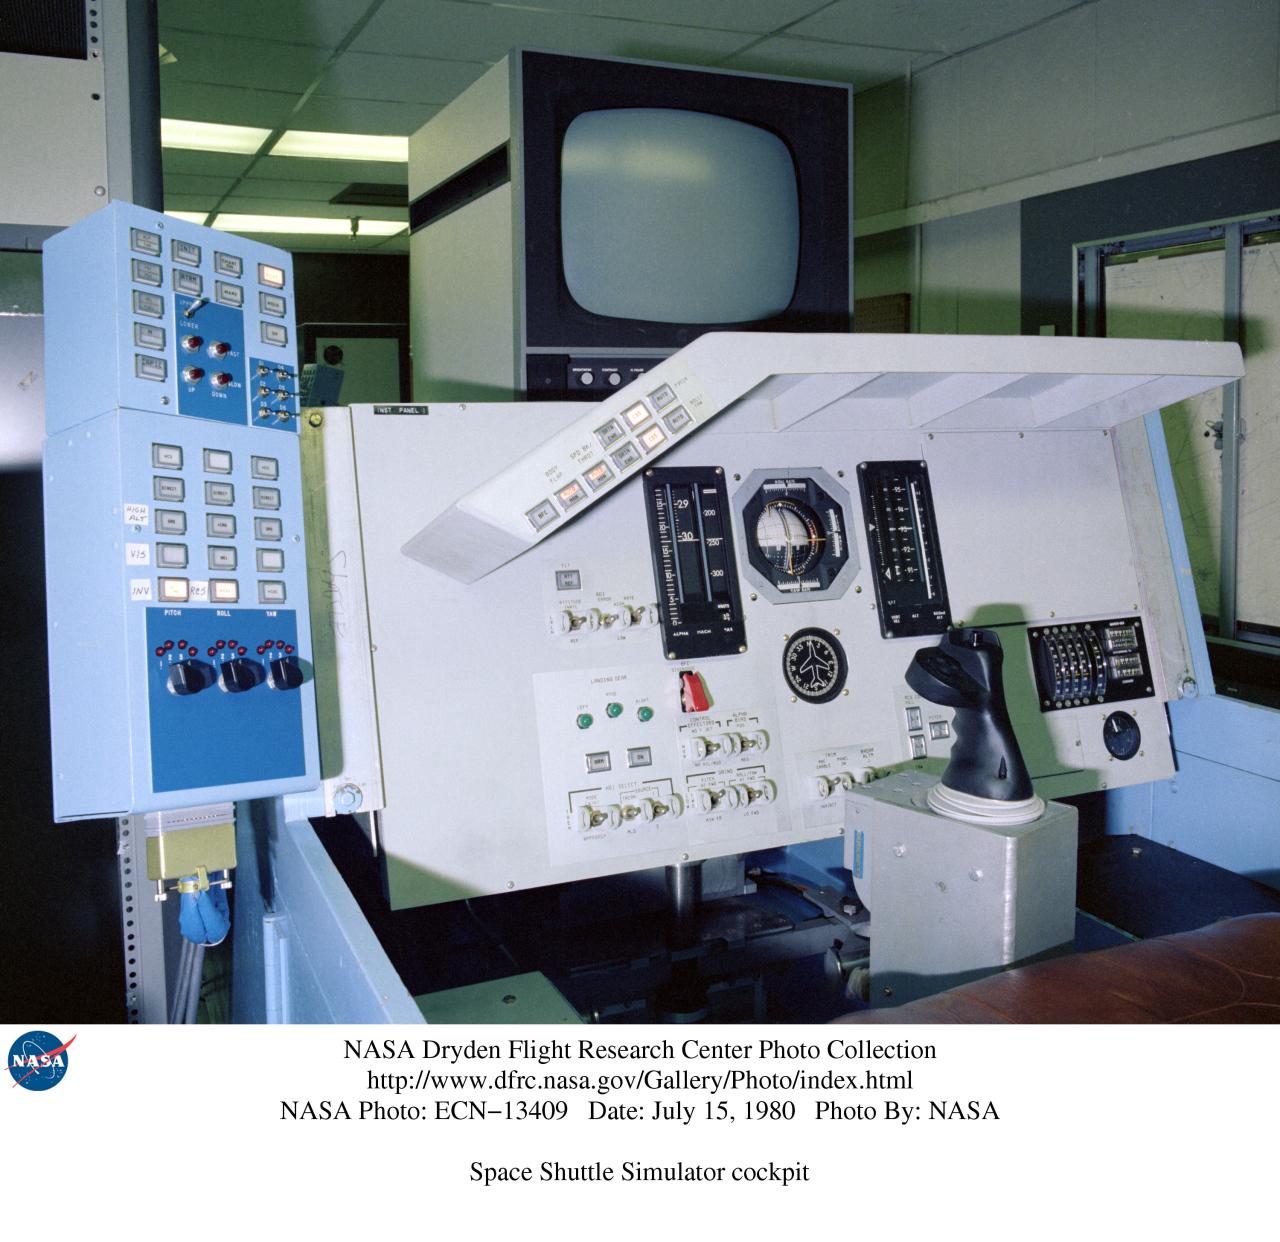 nasa sms simulator - photo #41